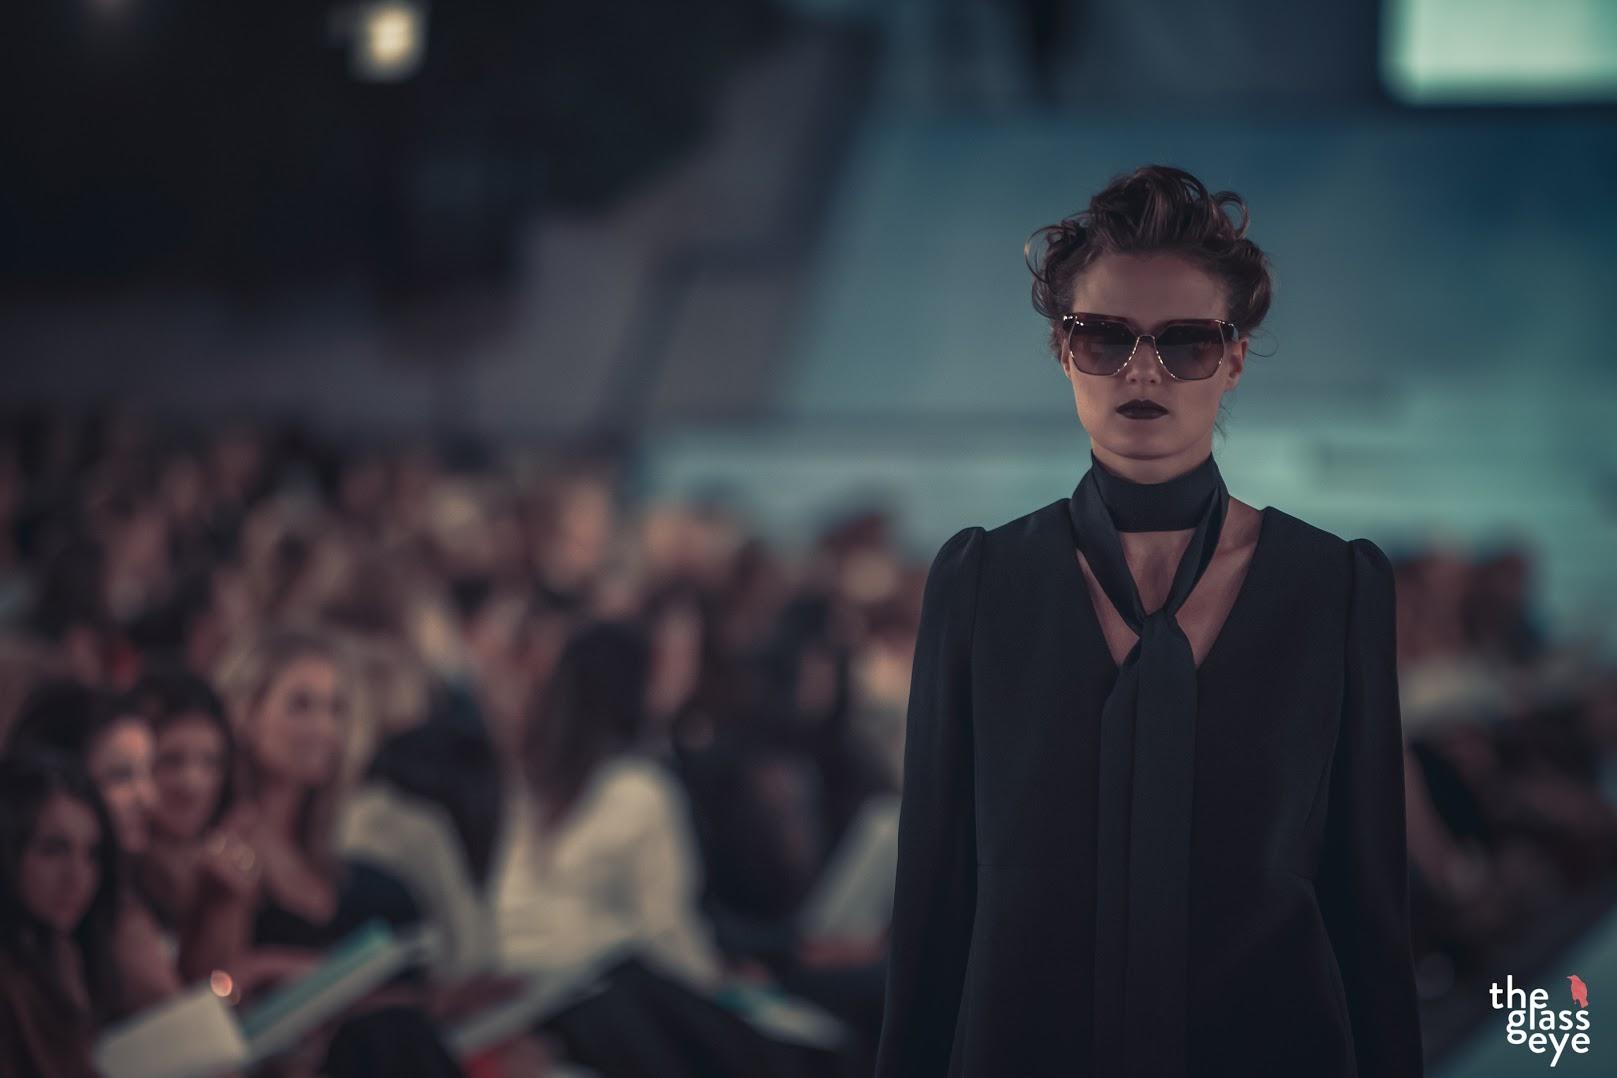 TGE_Nordstrom_FashionShow_VCB-022